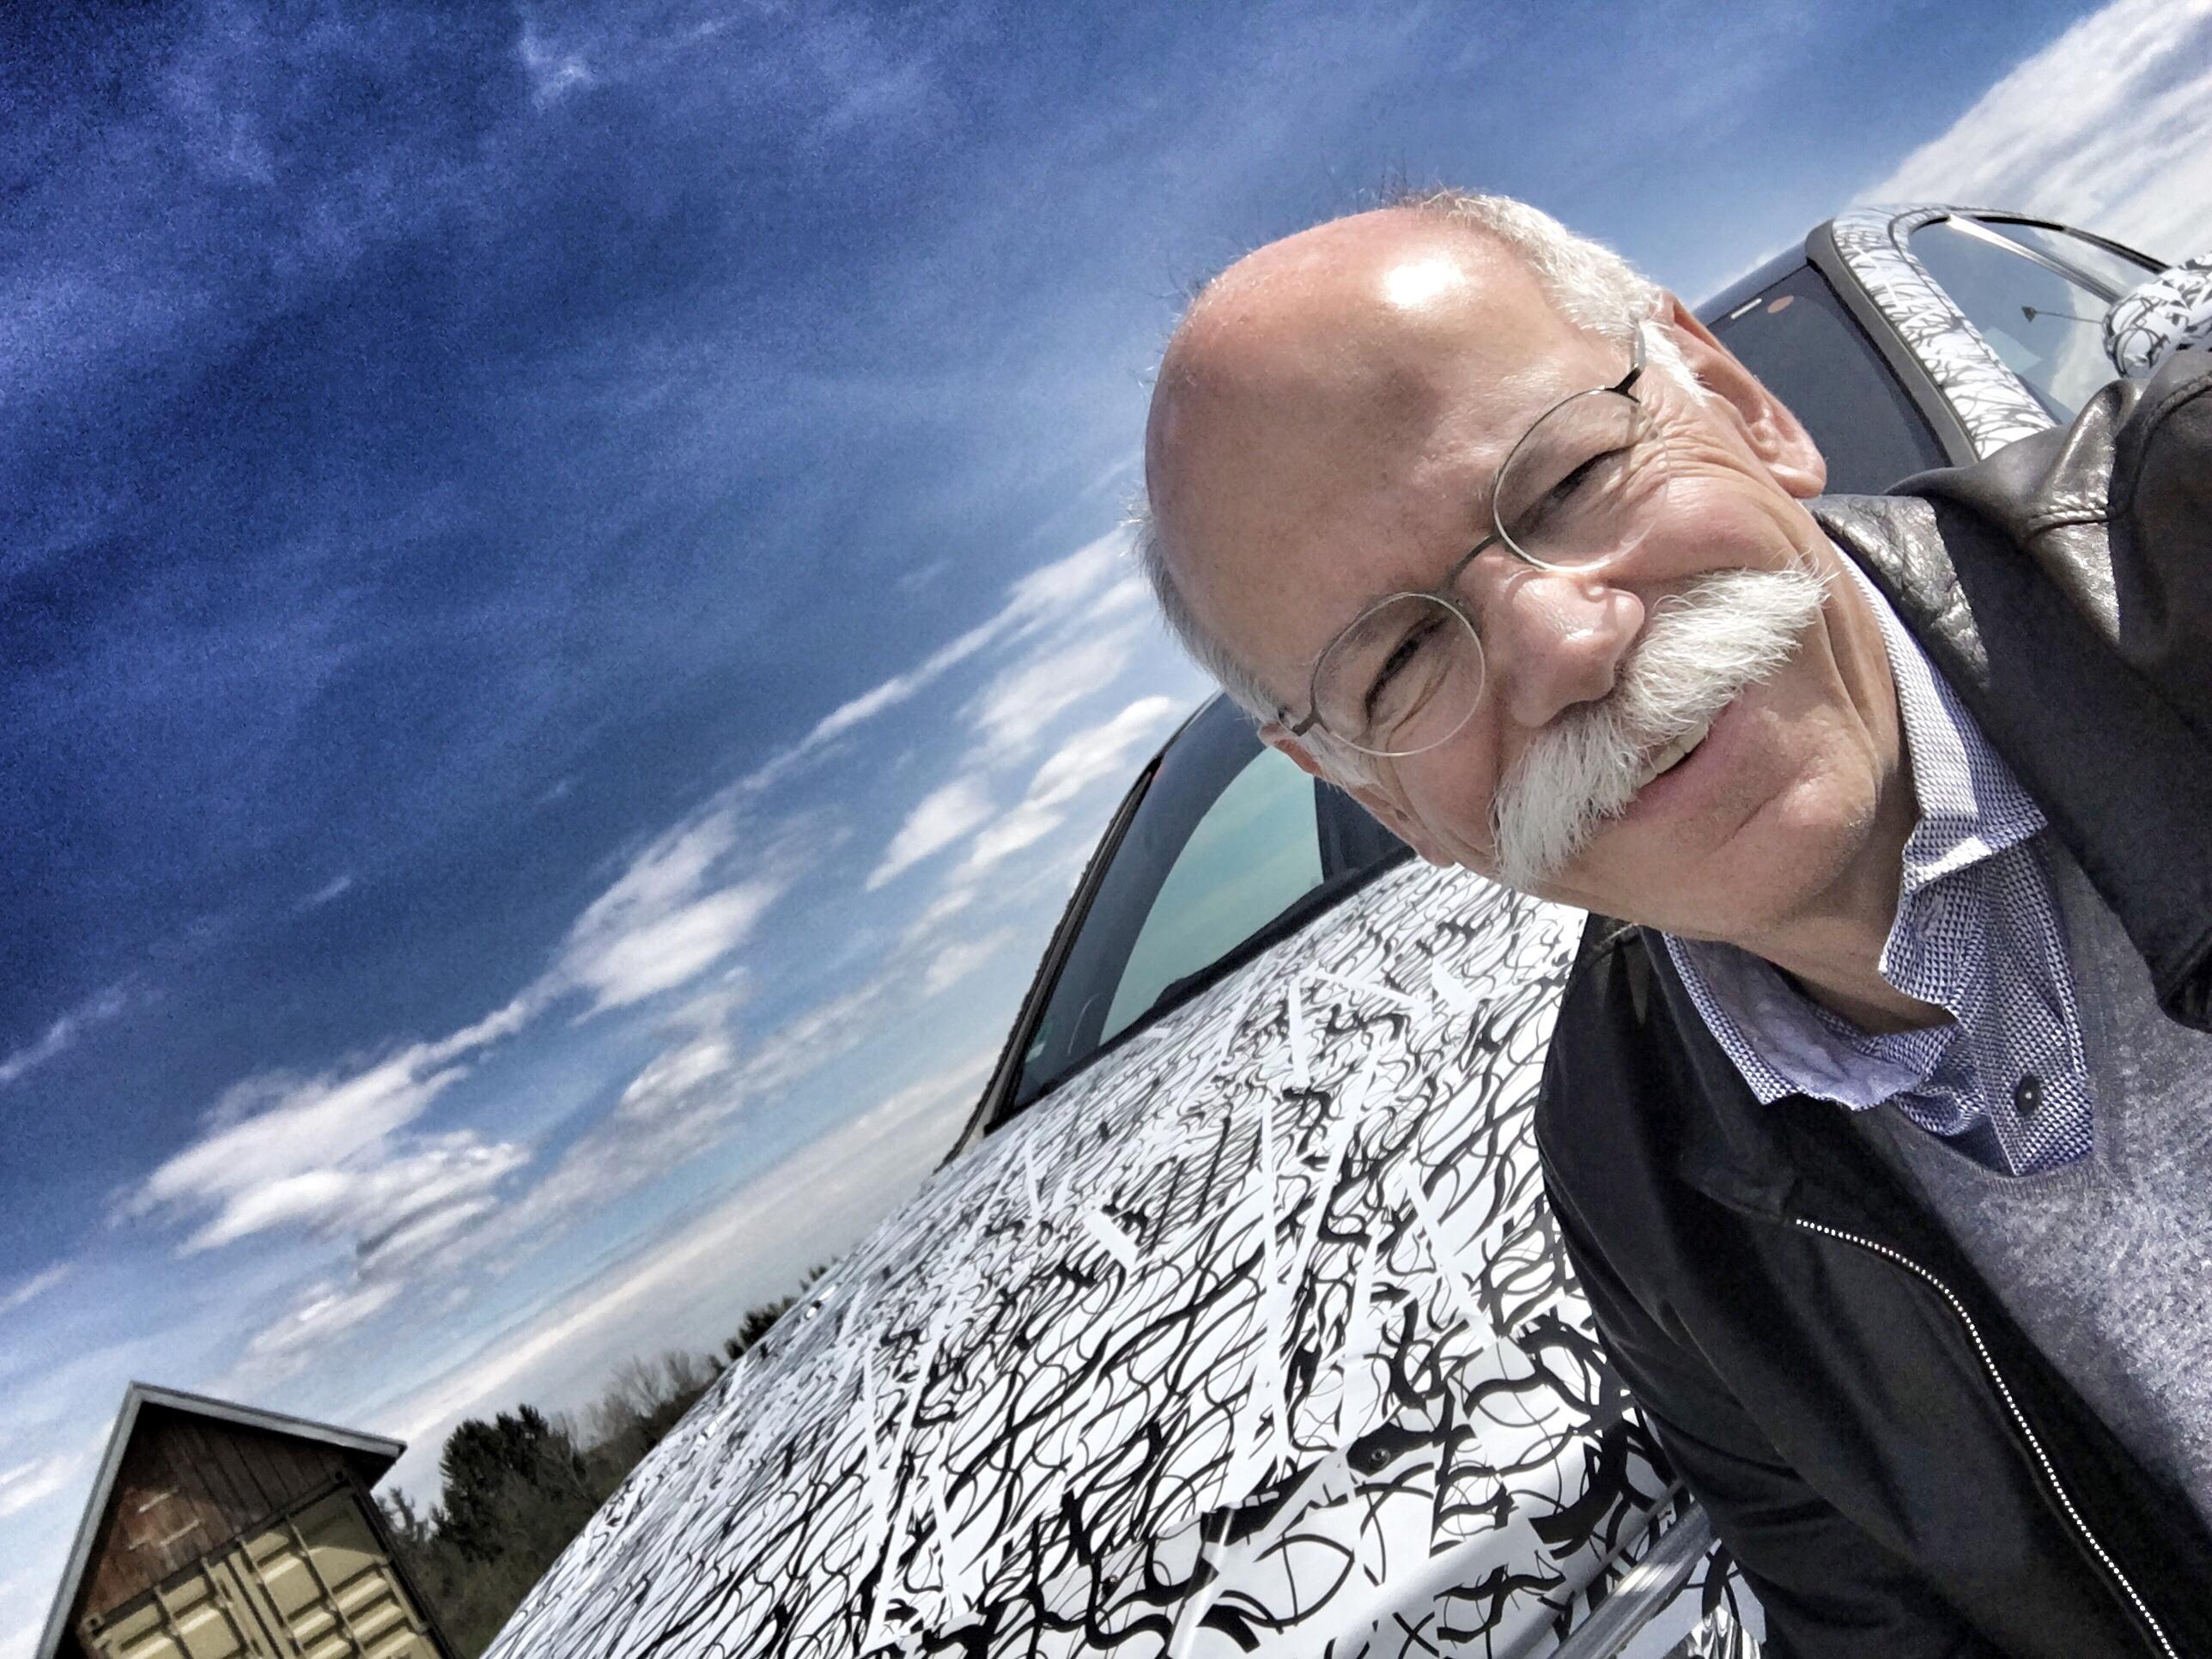 Mercedes-Benz-ի ղեկավարը մասնակցել է A դասի հեչբեքի փորձարկումներին